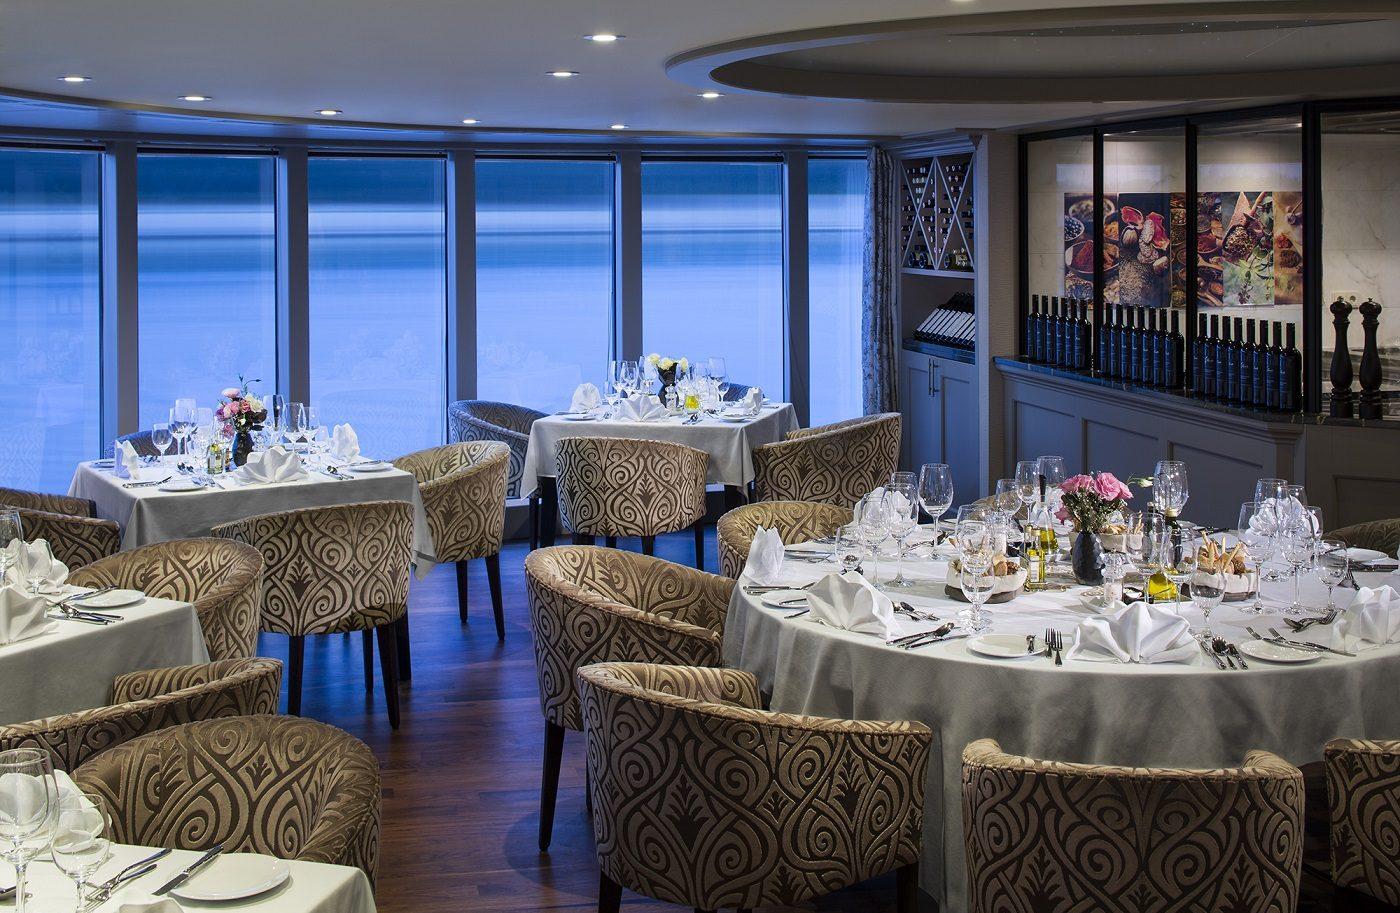 Erlebnis Restaurang ombord M/S AMA PRIMA